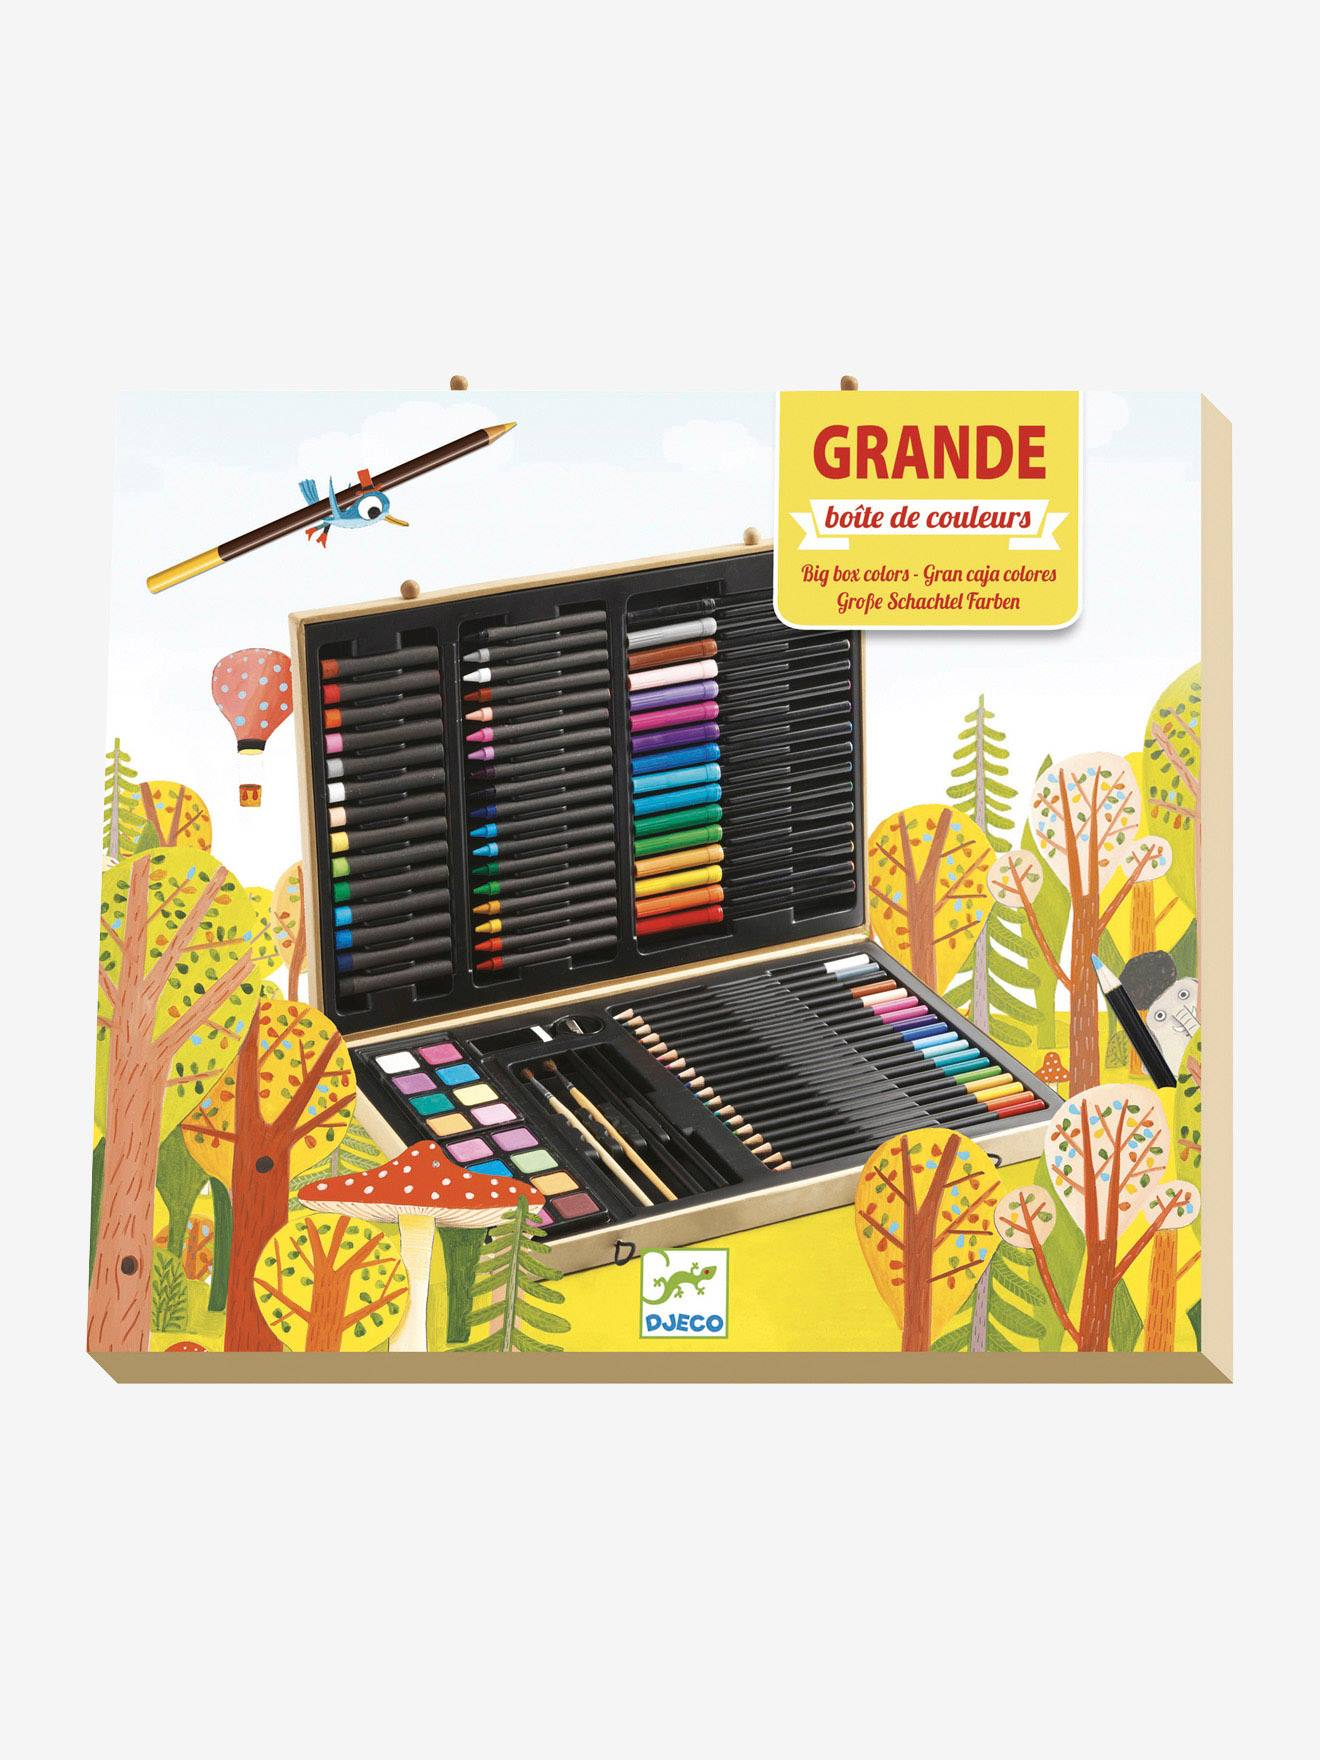 Grande boîte de couleurs DJECO multicolore